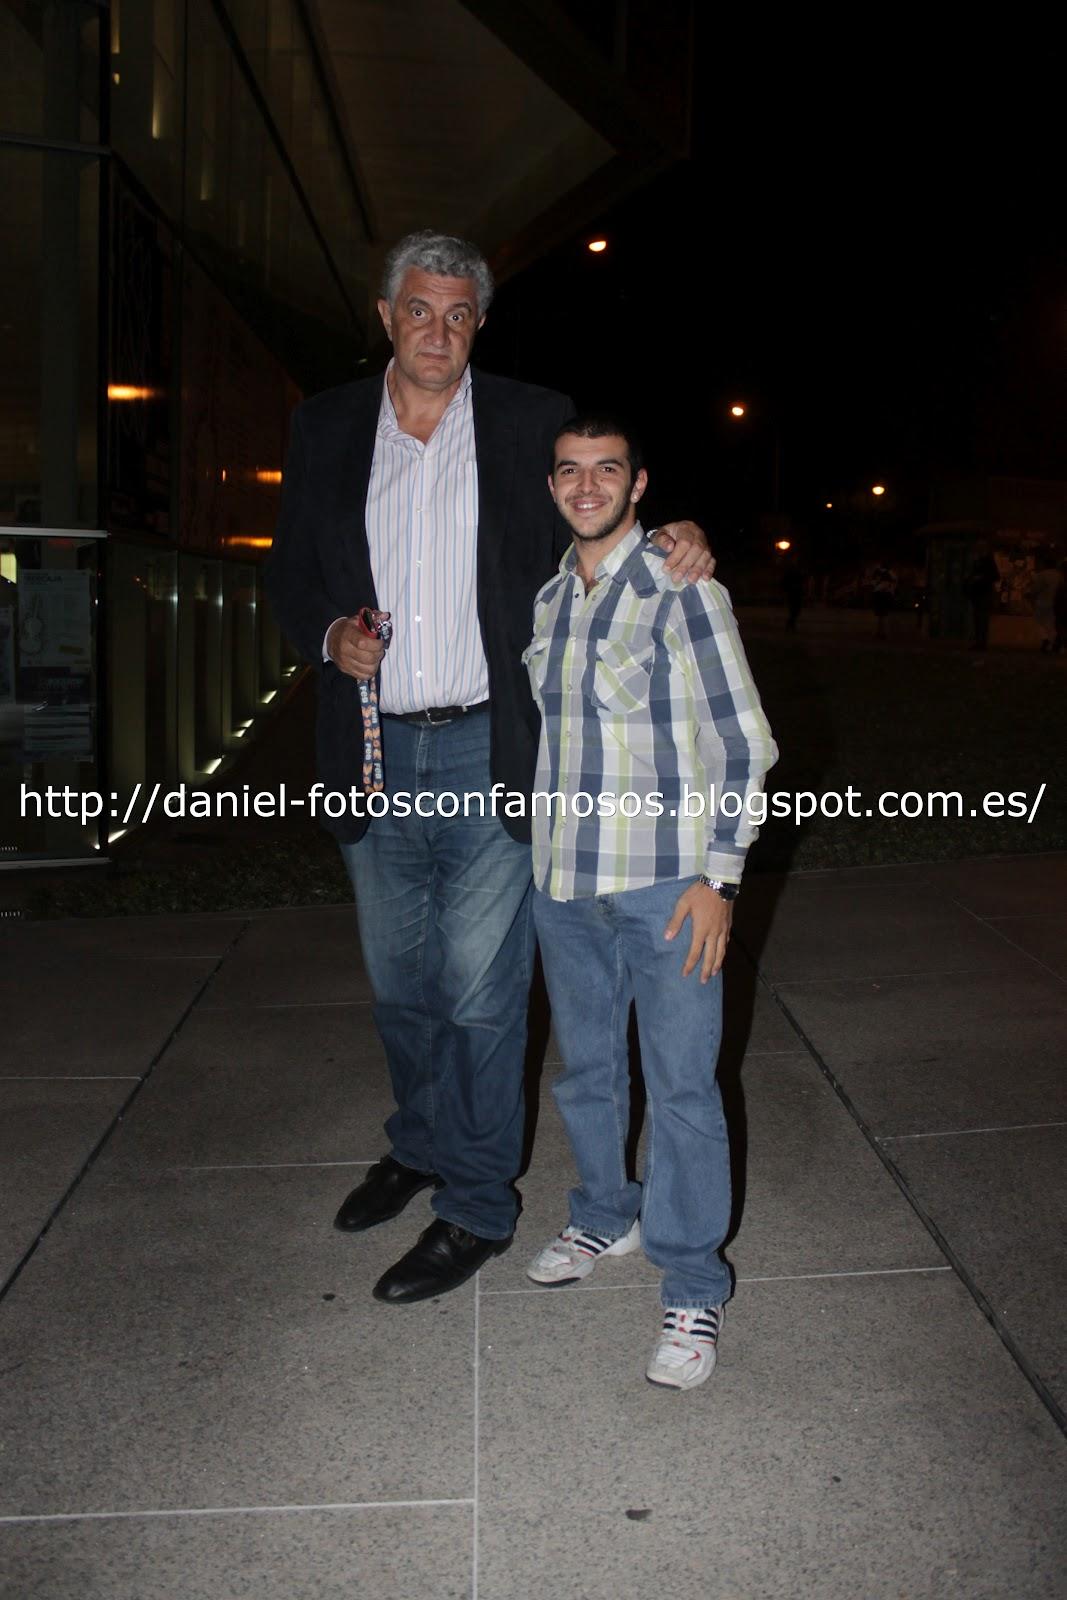 ¿Cuánto mide Danifotos? (Daniel fotos con famosos) -  (cazafotos) - Altura Romay